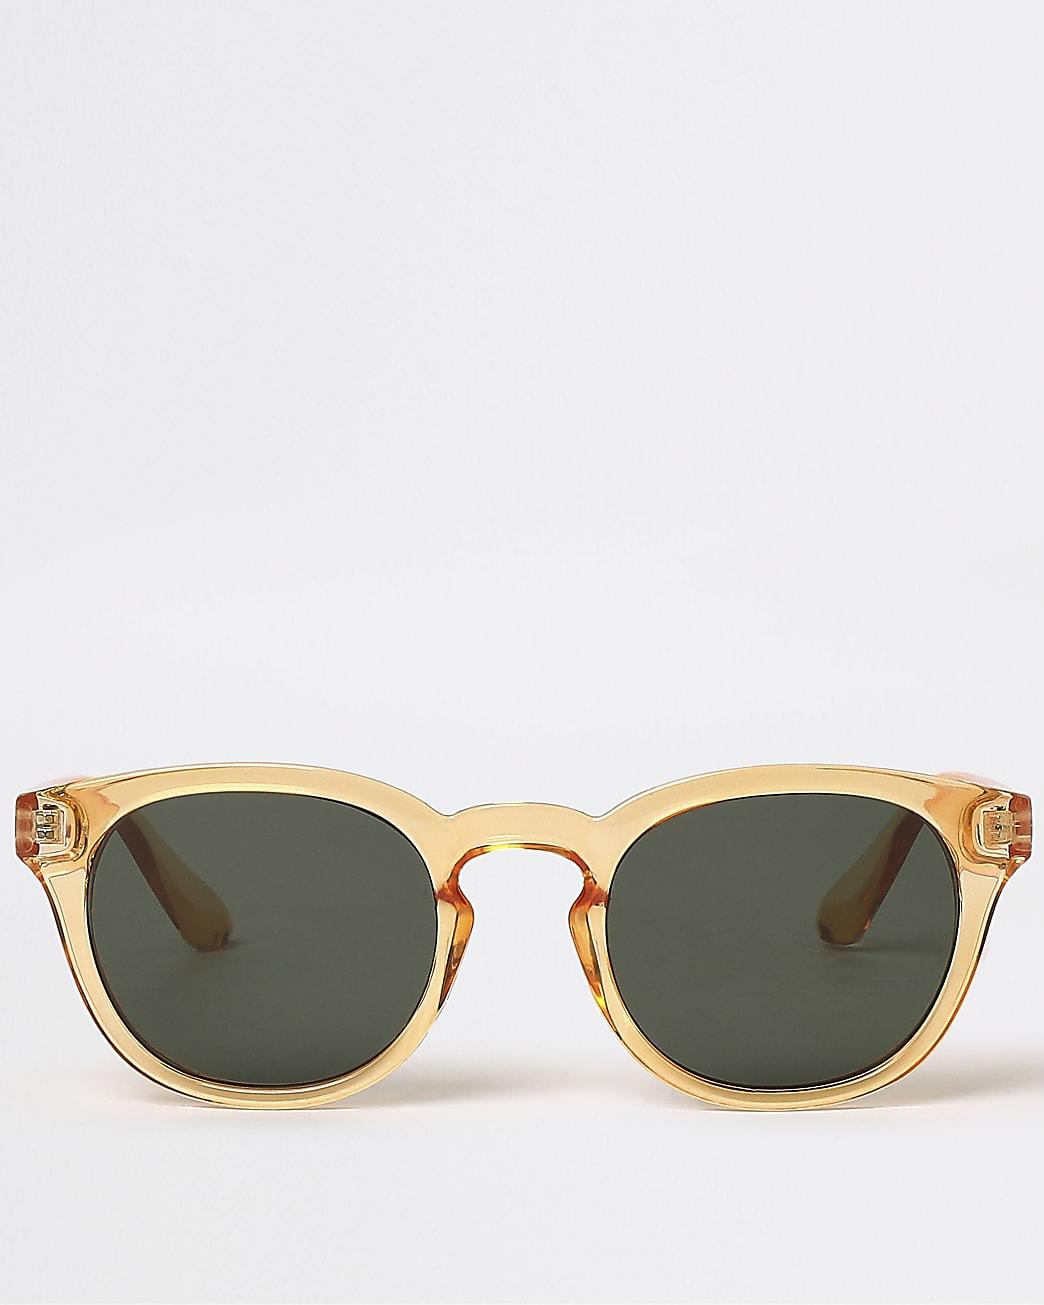 Orange round frame sunglasses